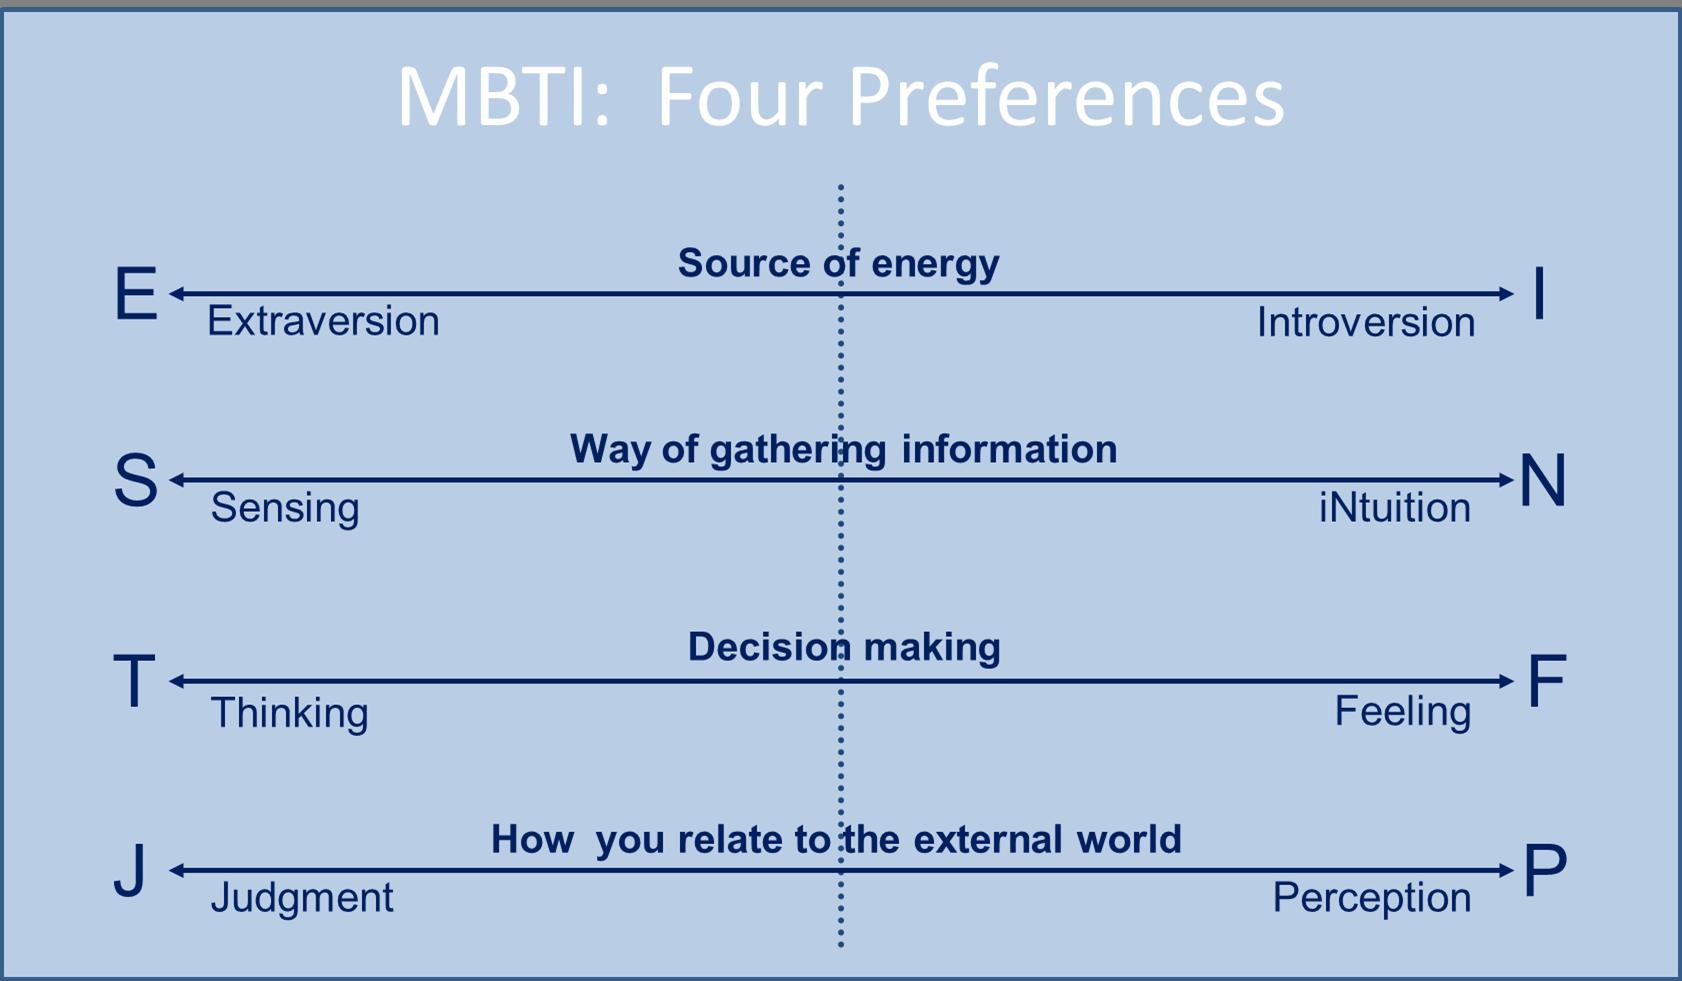 MBTI Four Preferences